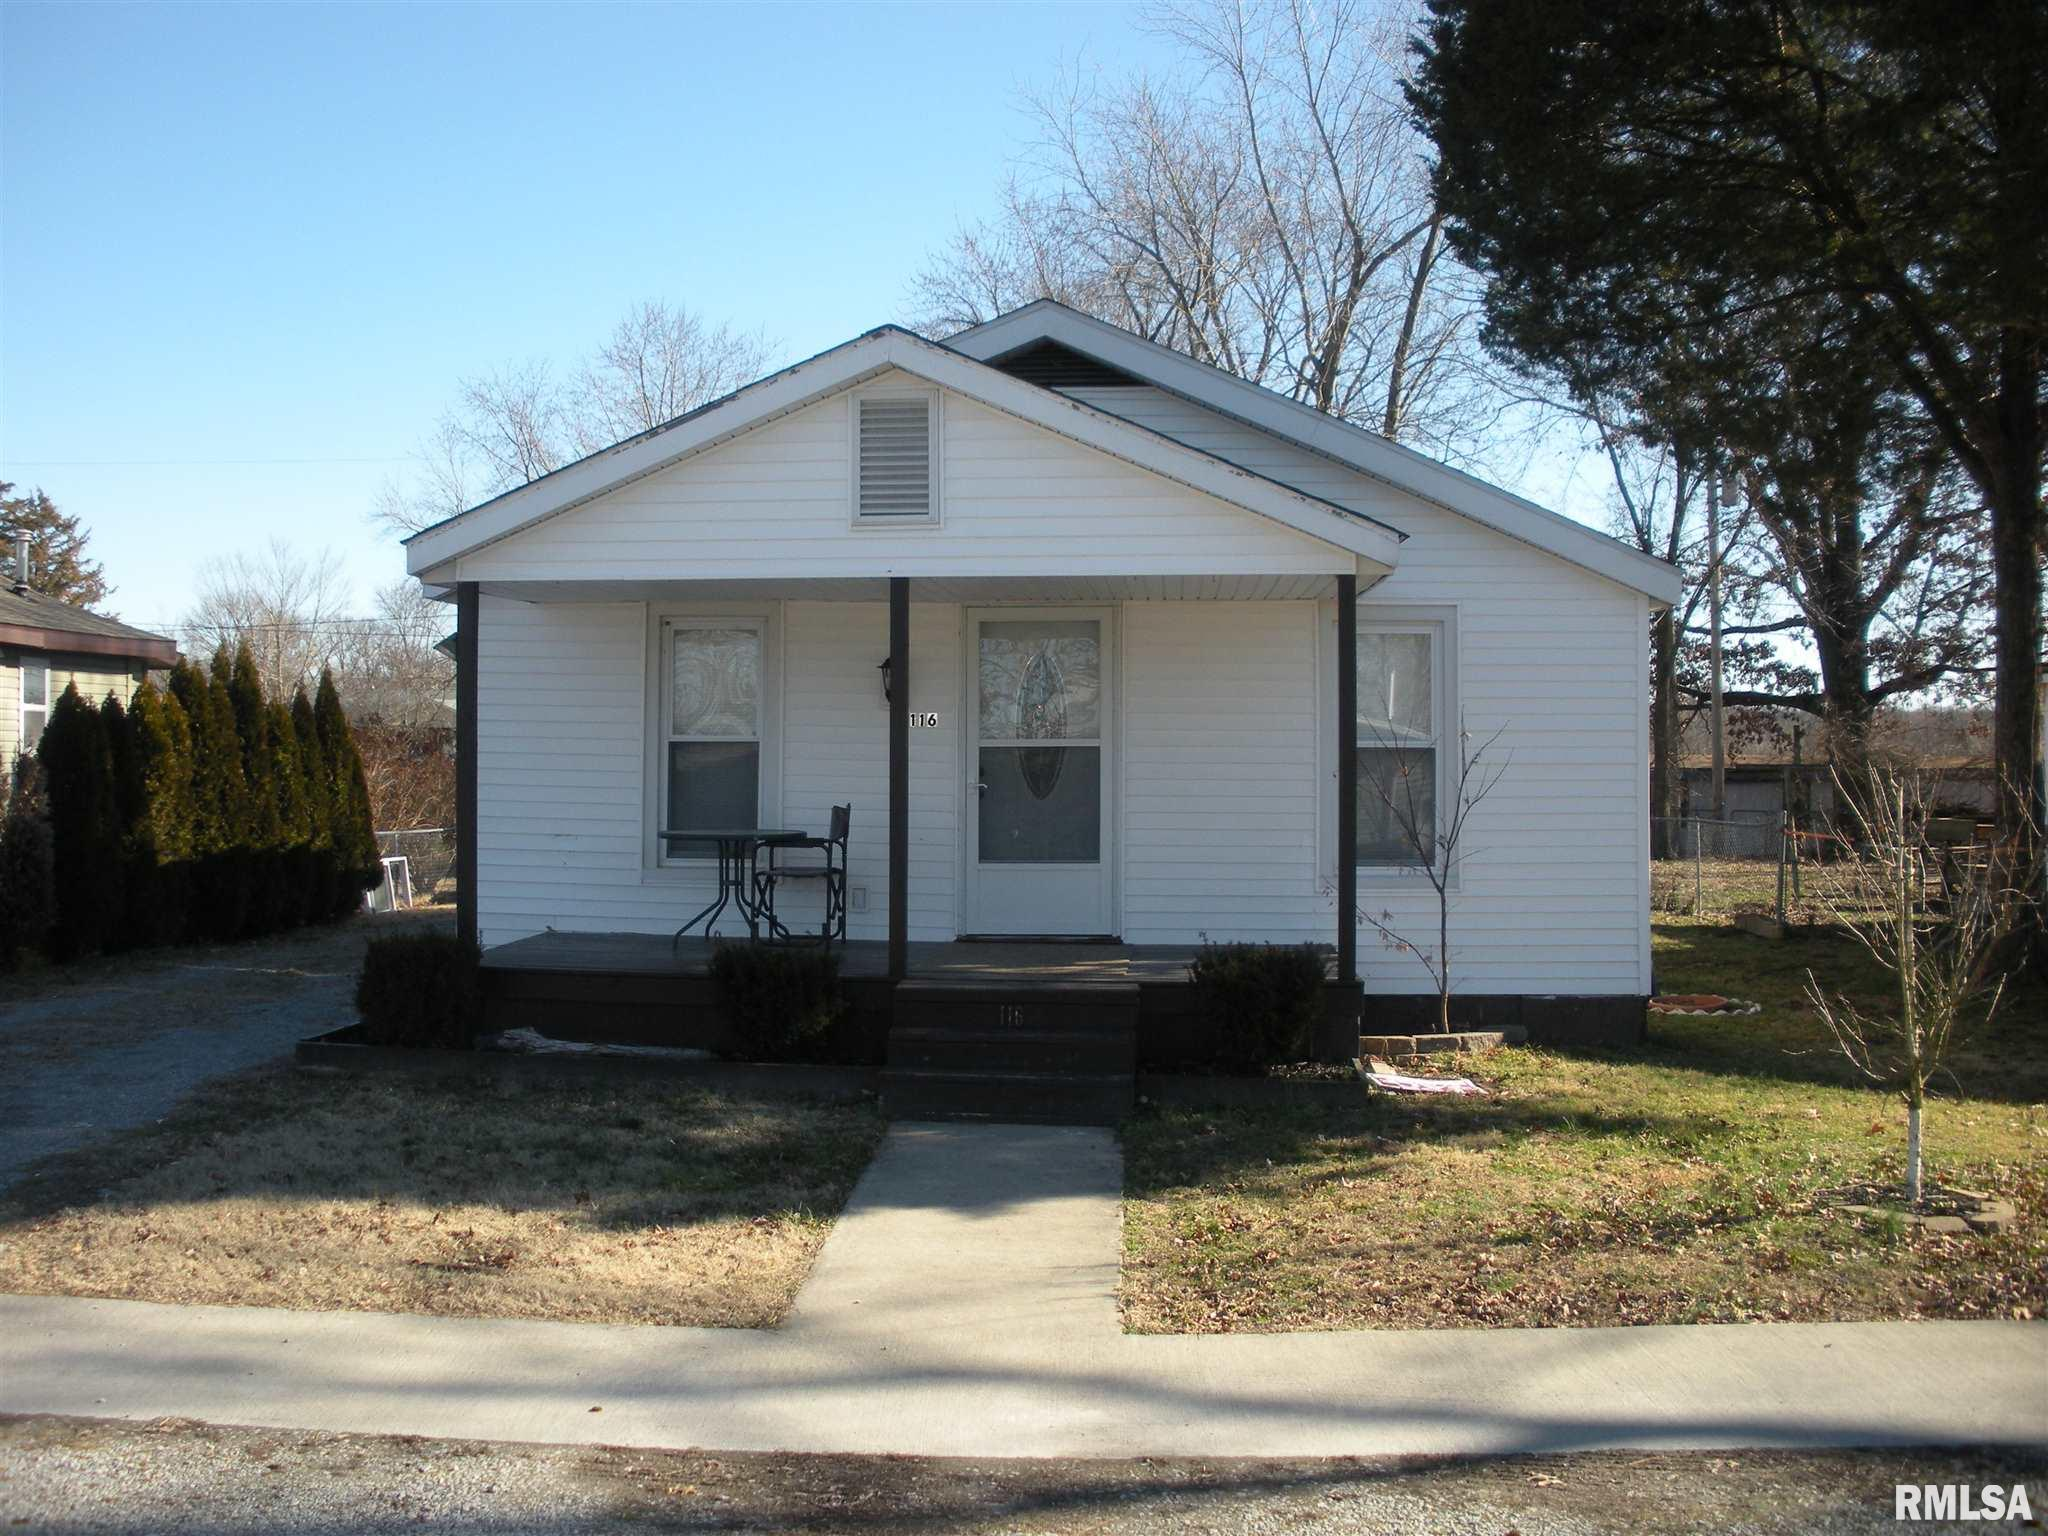 116 N WILSON Property Photo - Hurst, IL real estate listing